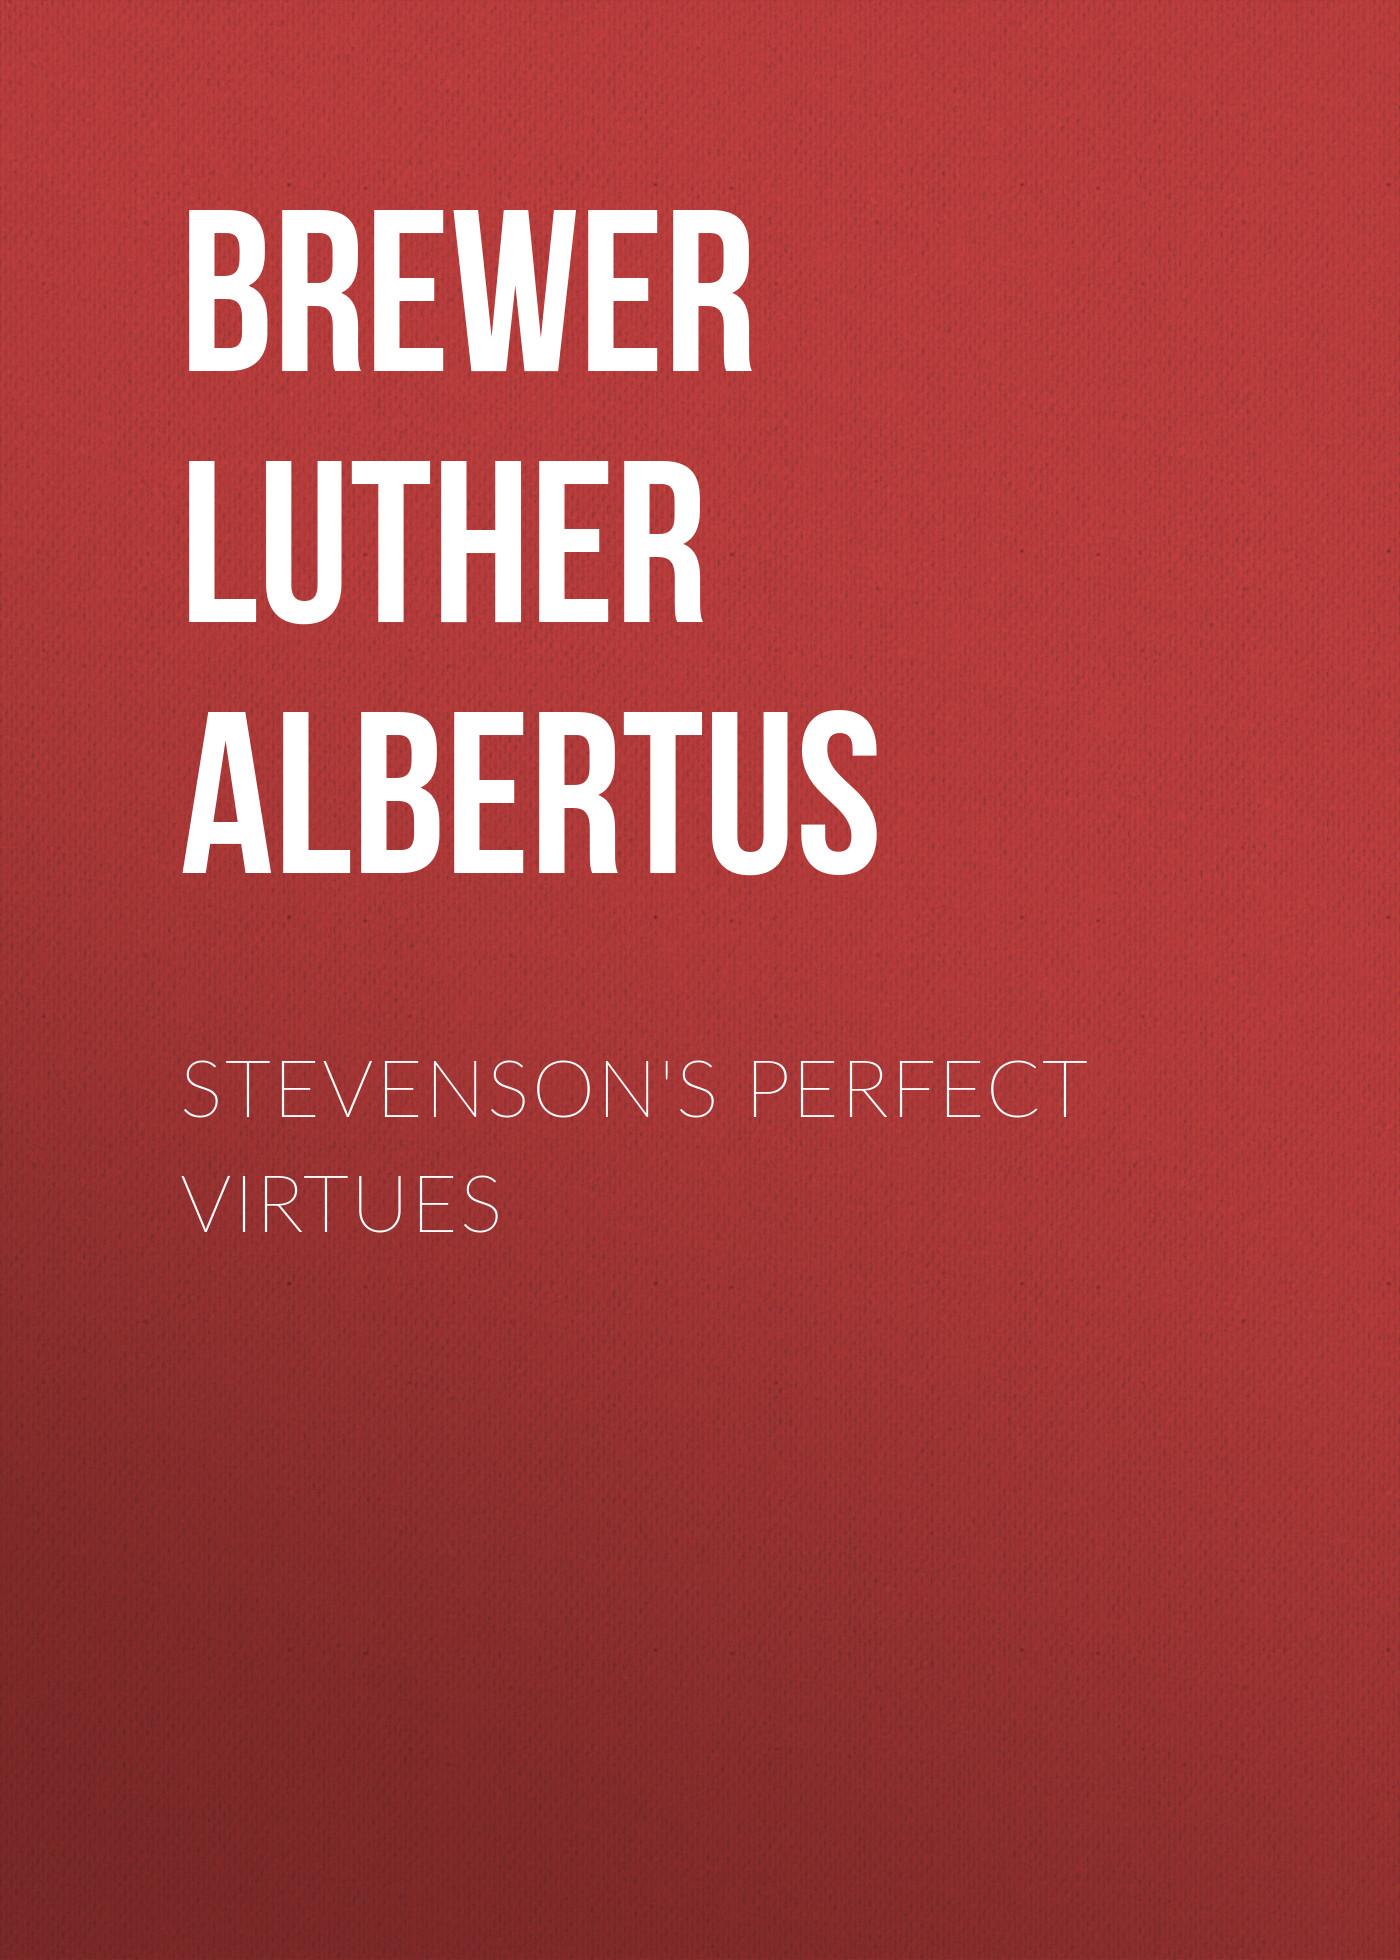 Stevenson's Perfect Virtues